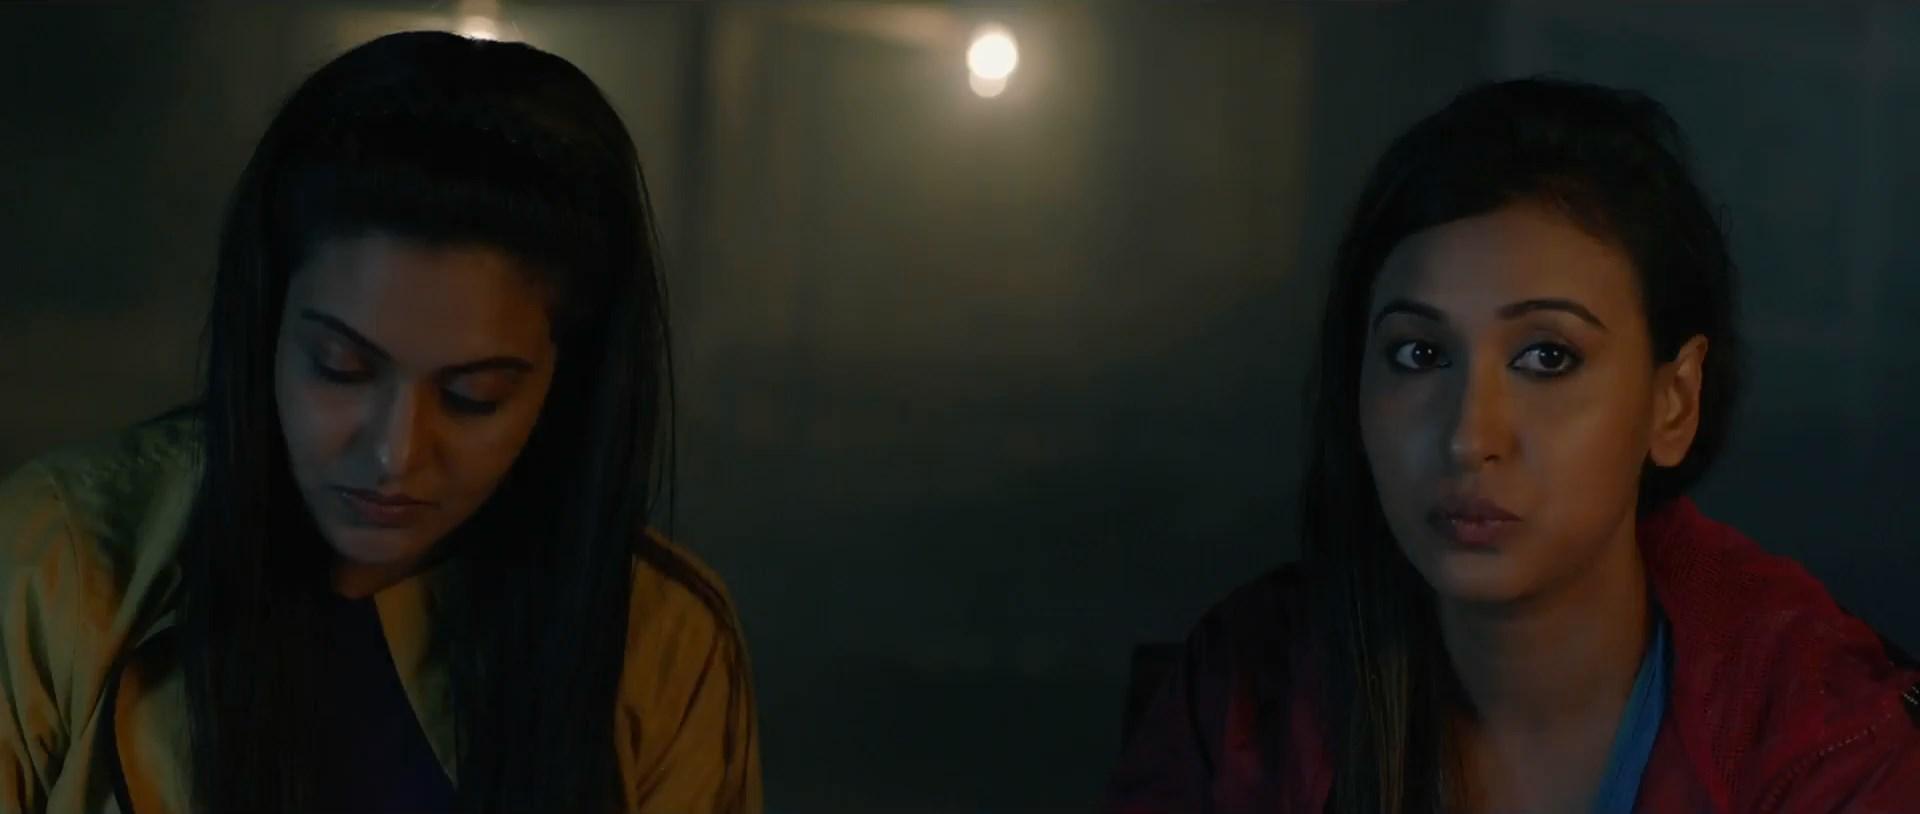 KAYA The Mystery Unfolds 2021 Bengali Movie 1080p WEB DL x264 AAC.mp4 snapshot 01.03.12.541